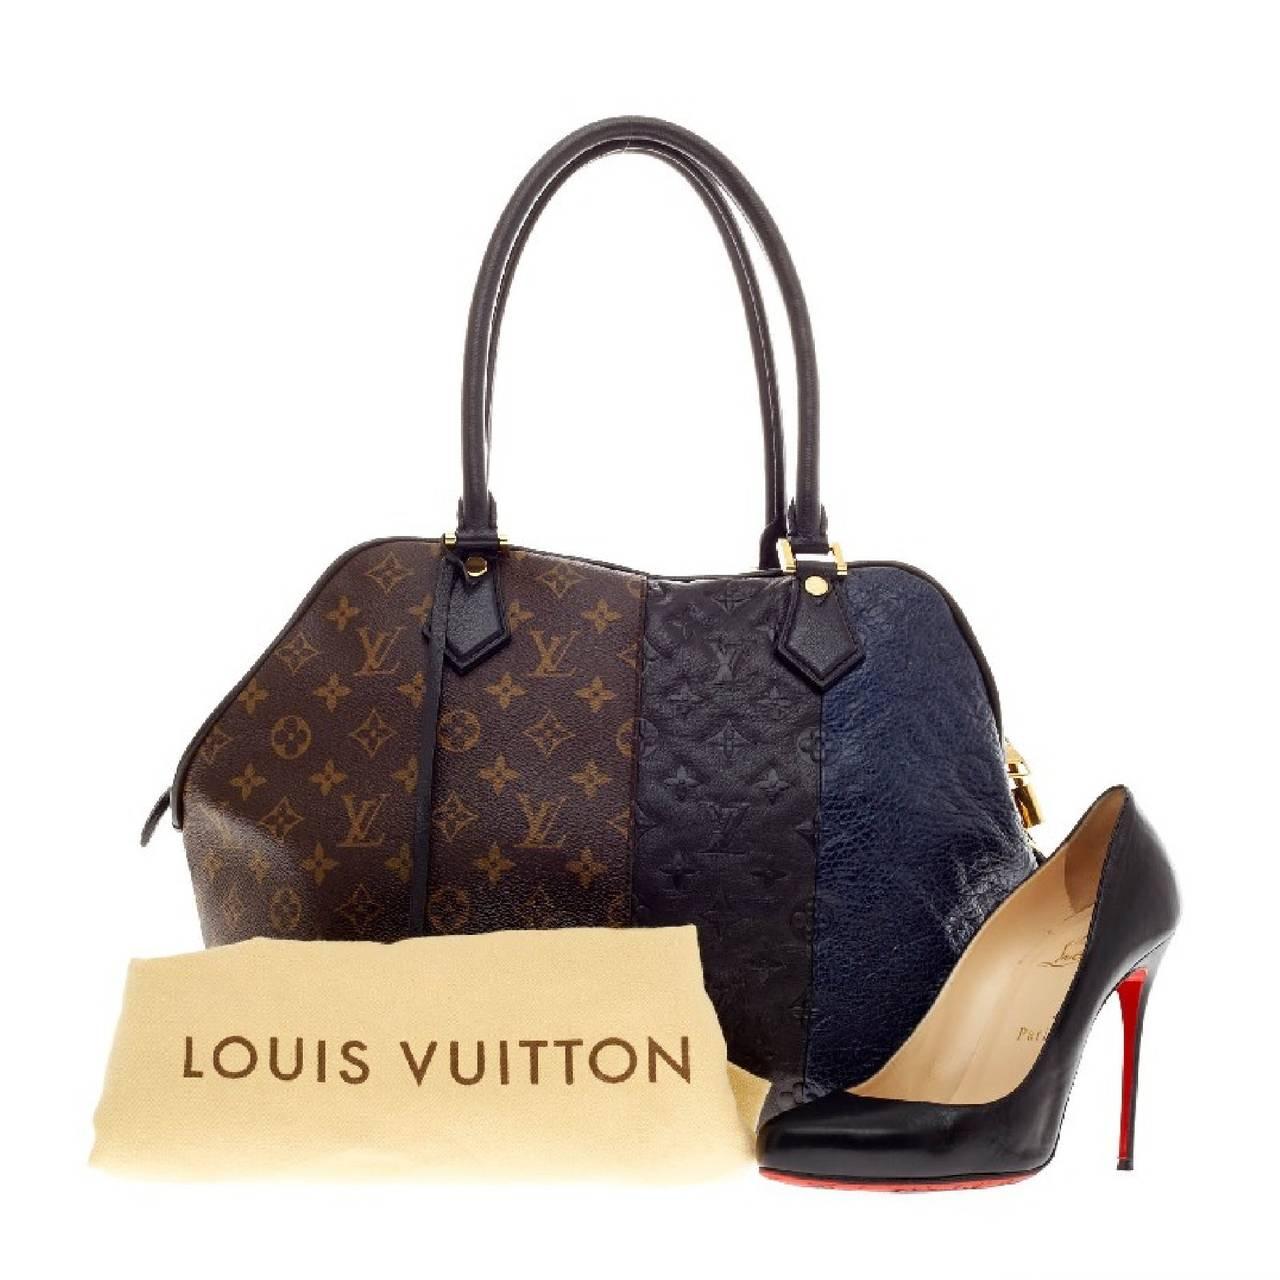 f7b41b6544c Louis Vuitton Blocks Zipped Tote Limited Edition Monogram at 1stdibs. Tote  Miroir Patent Leather - Handbags ...